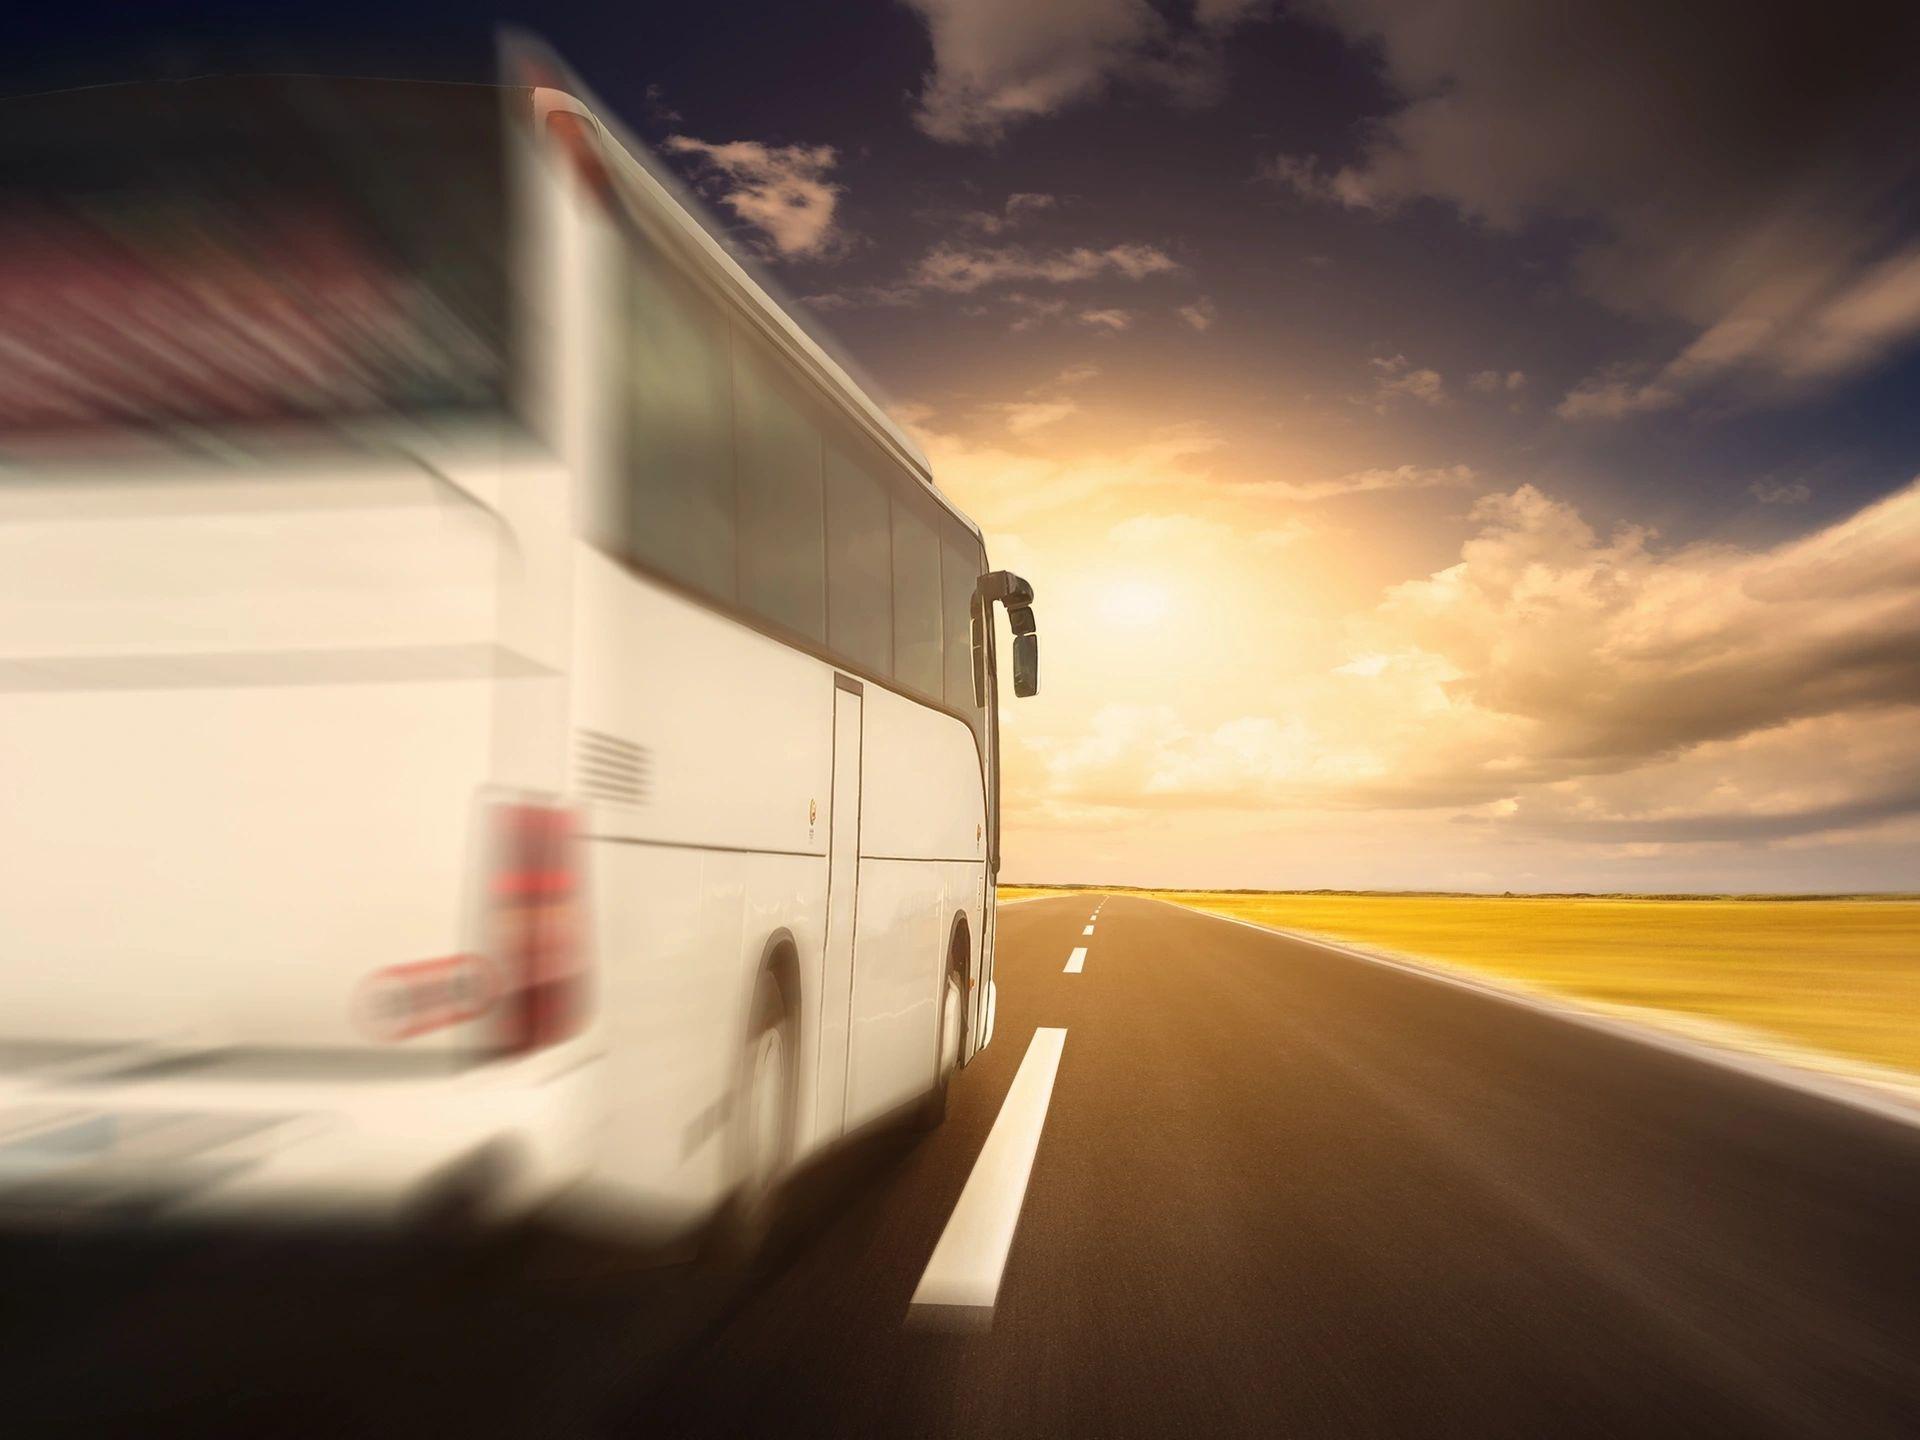 Bus trips to chumash casino suites casino